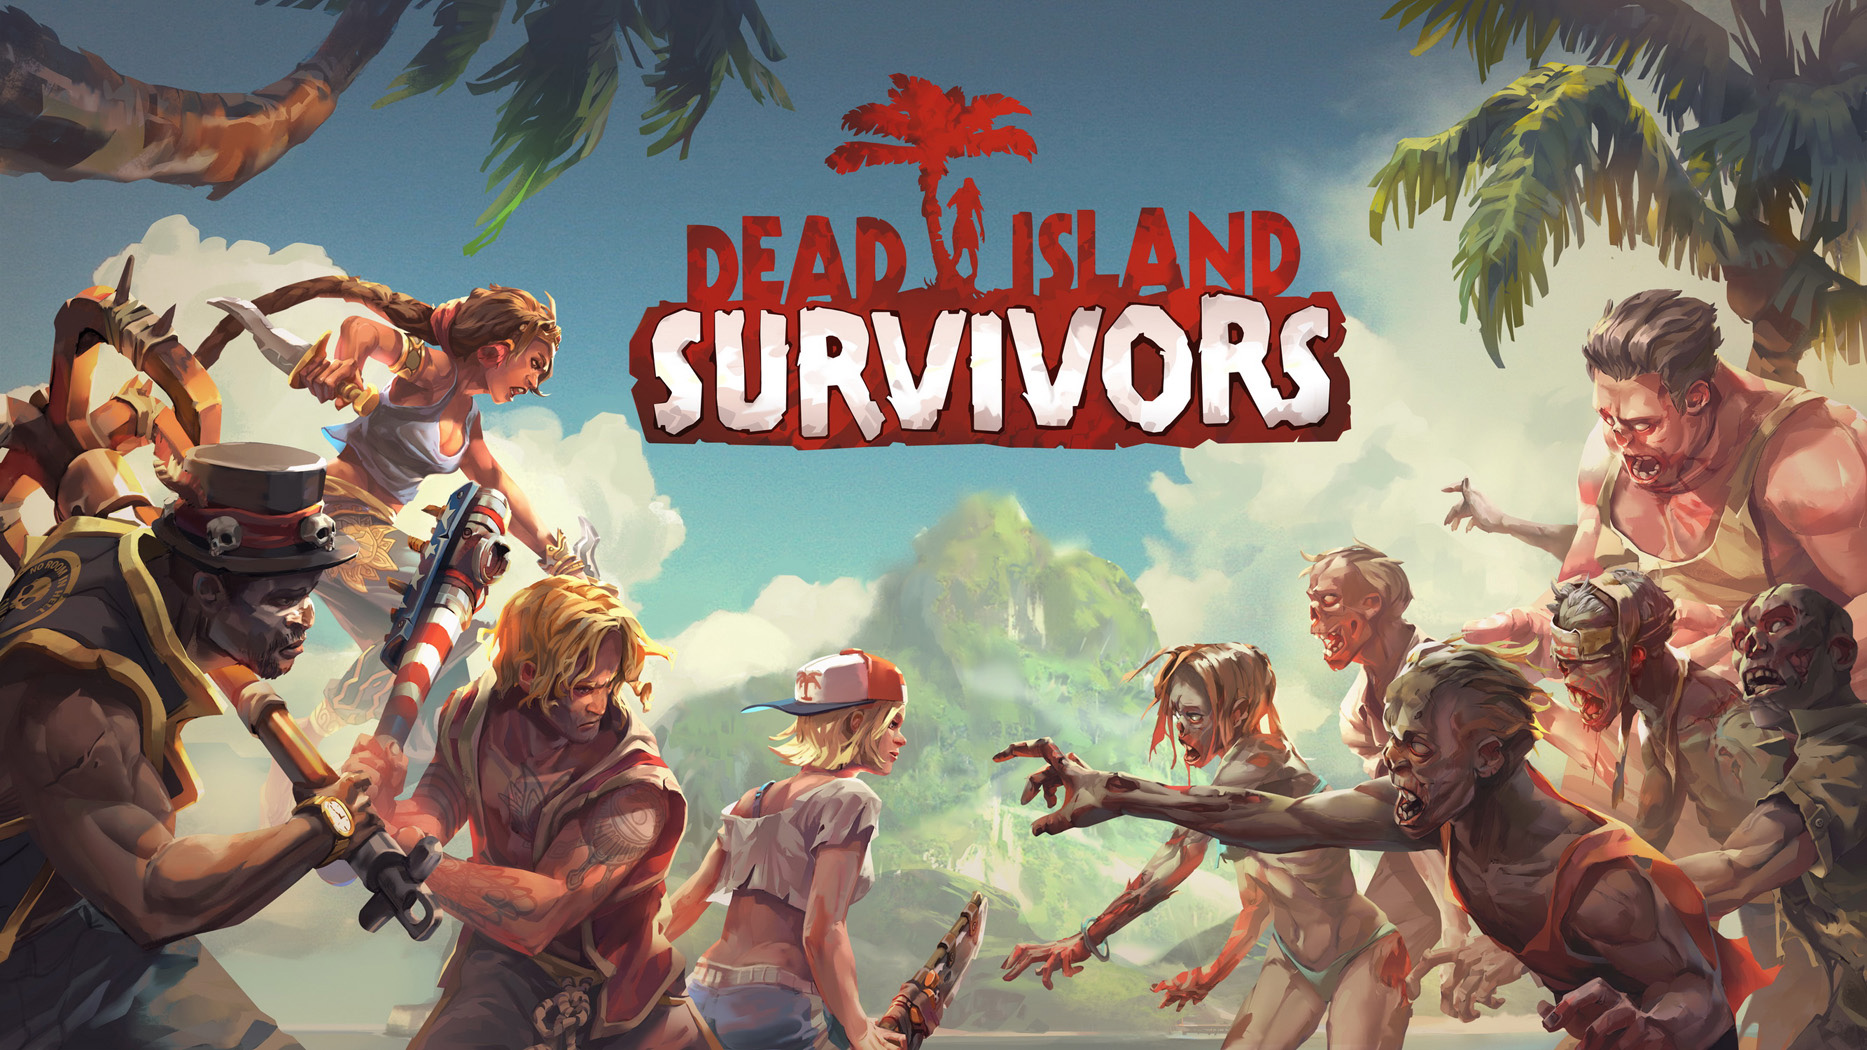 http://www.idgtv.es/archivos/201807/dead-island-survivors-art.jpg